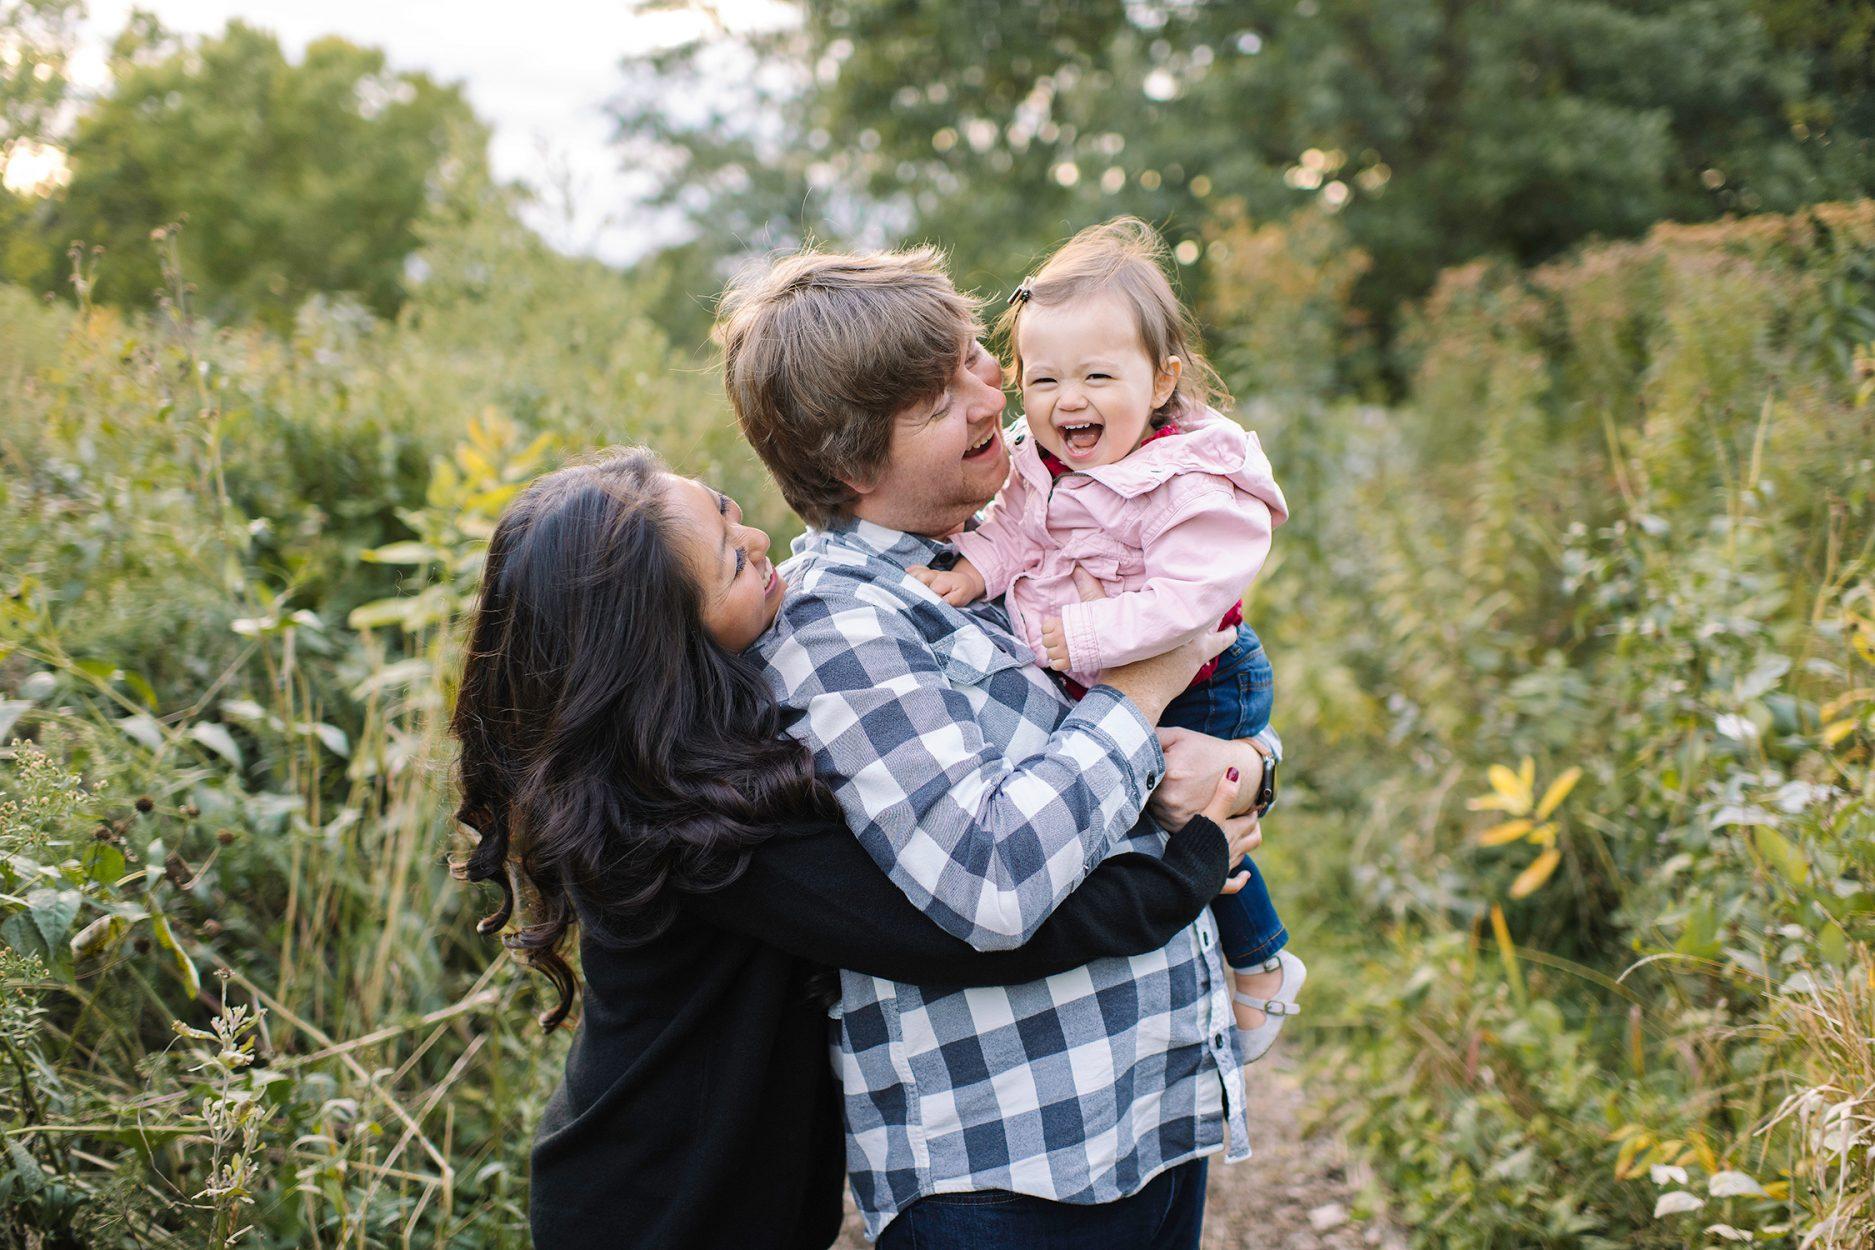 chicago-family-photographer-ravenswood-park